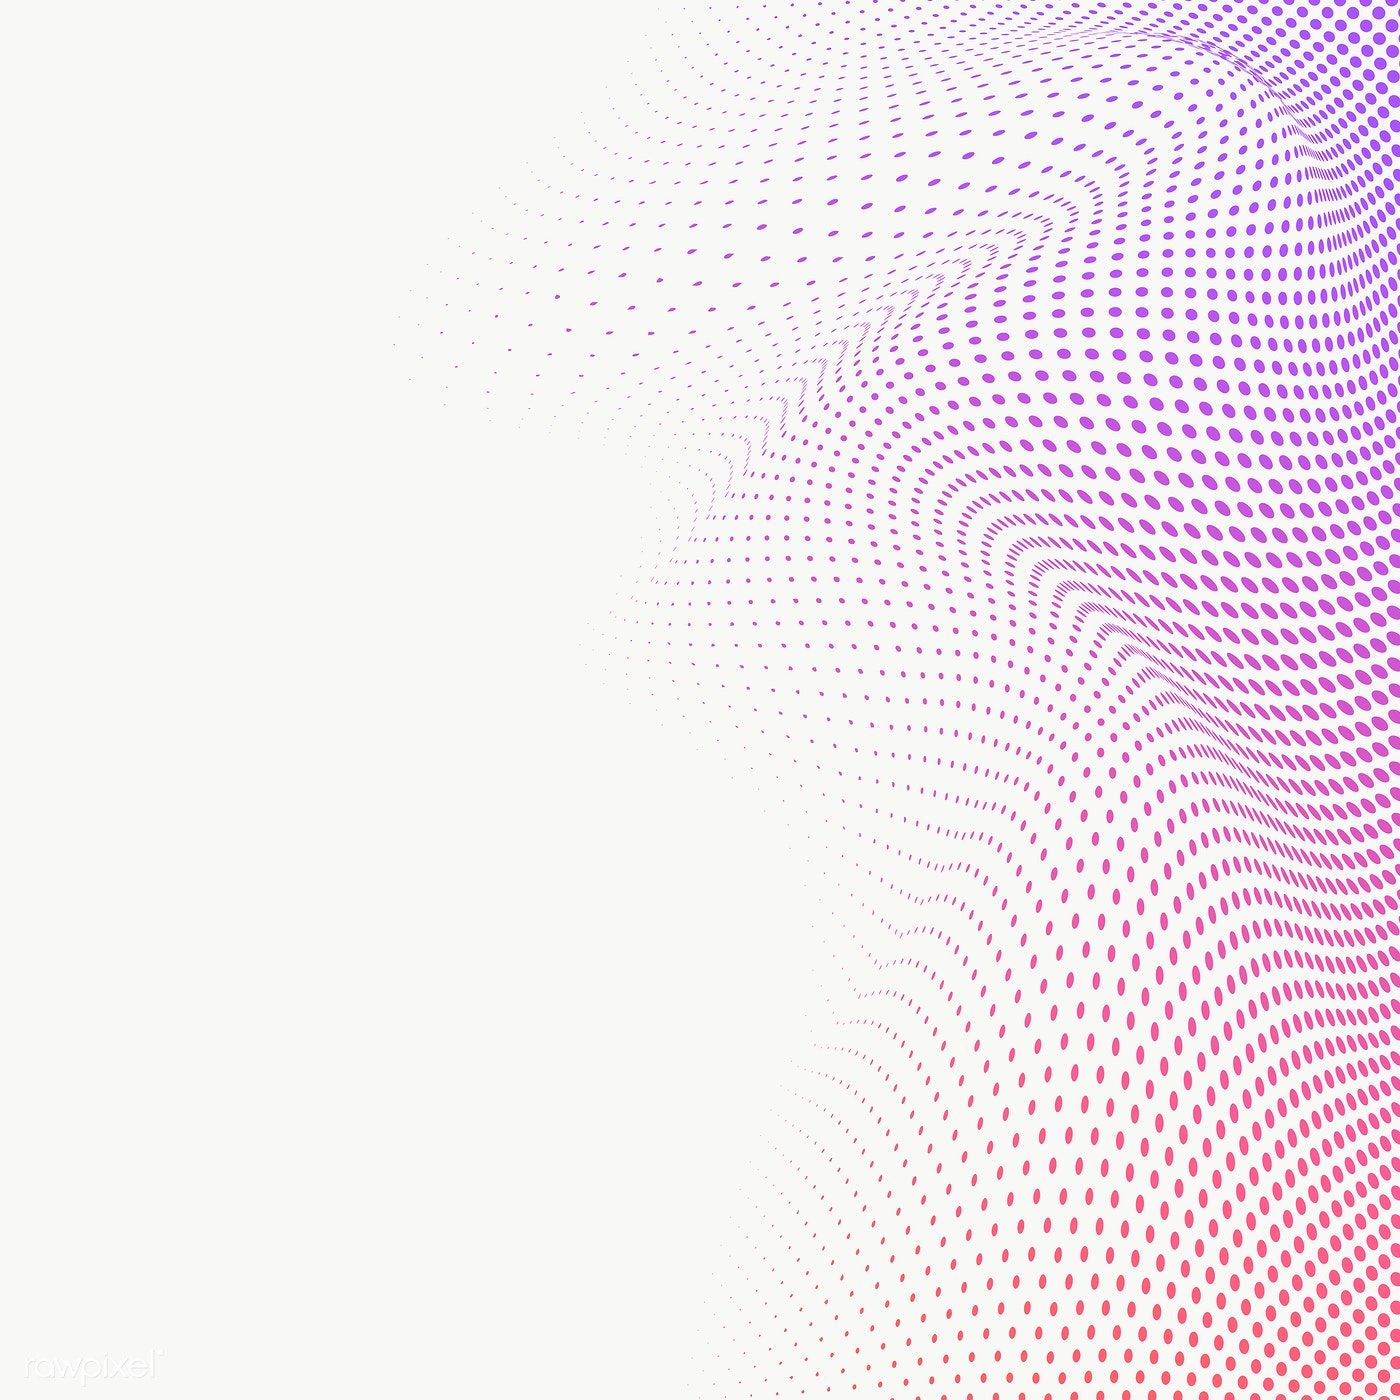 Colorful Halftone Dots Design Element Free Image By Rawpixel Com Mind Halftone Dots Halftone Dots Design